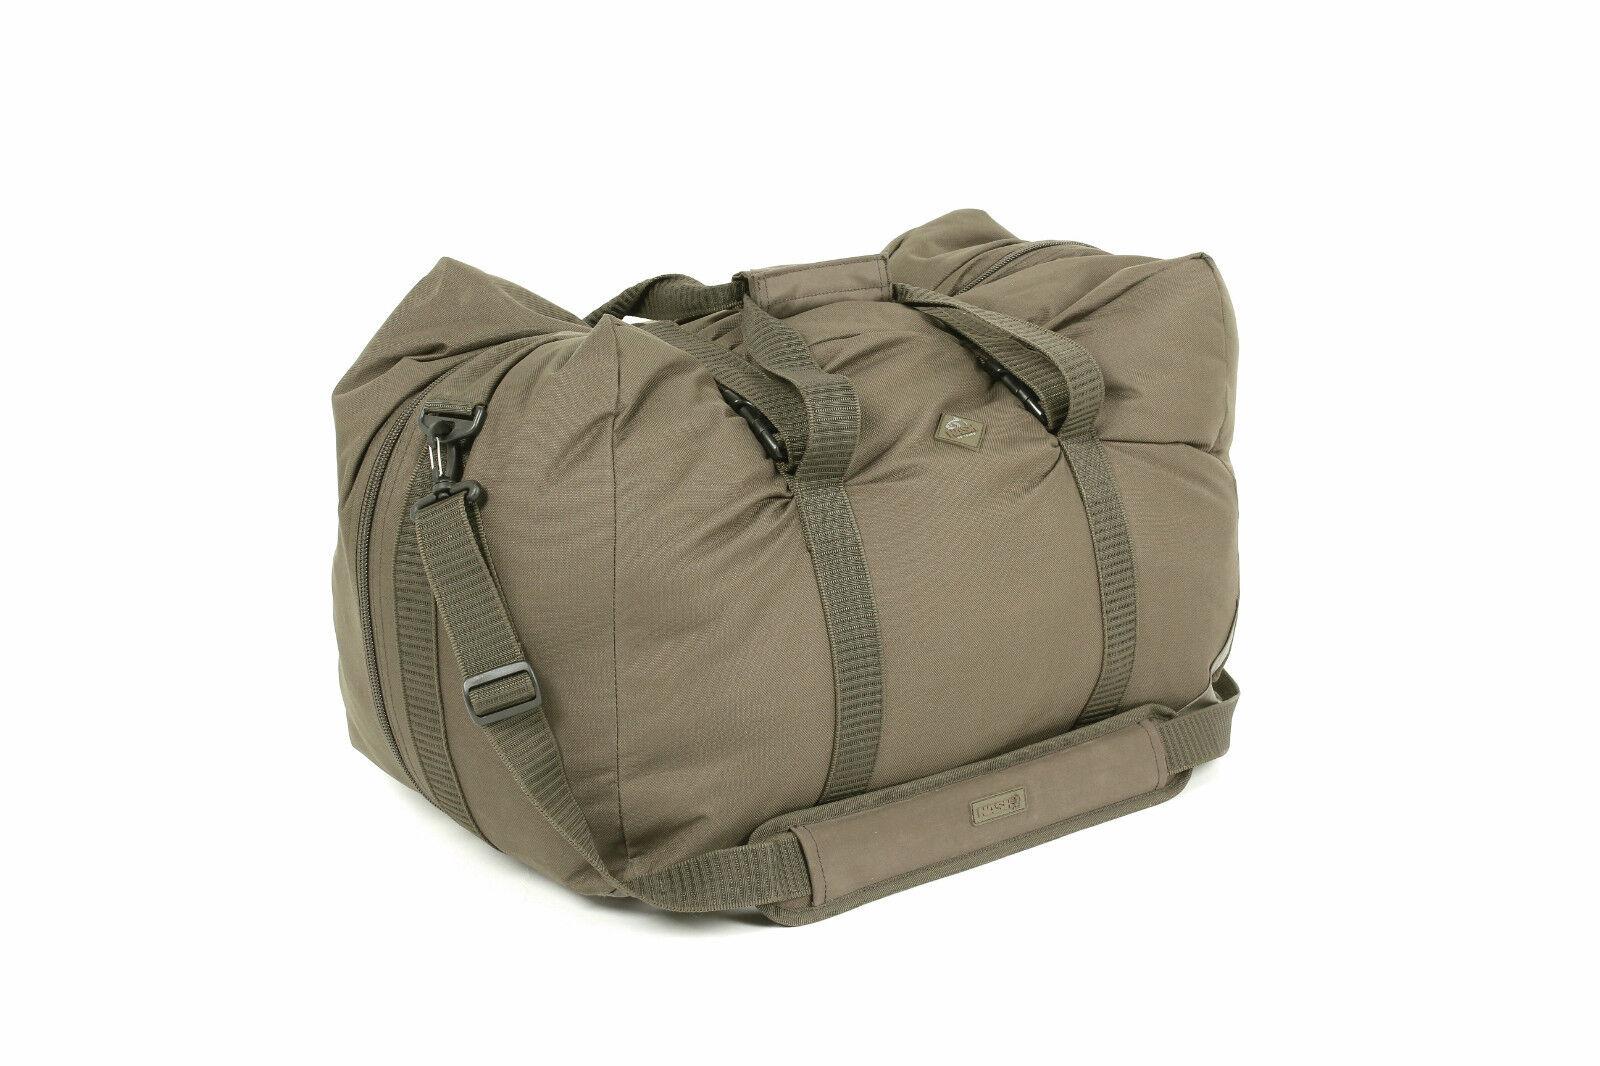 Nnash Kit Bag t3303 Bag Fishing Bag Carryall Bivy Bag   excellent prices